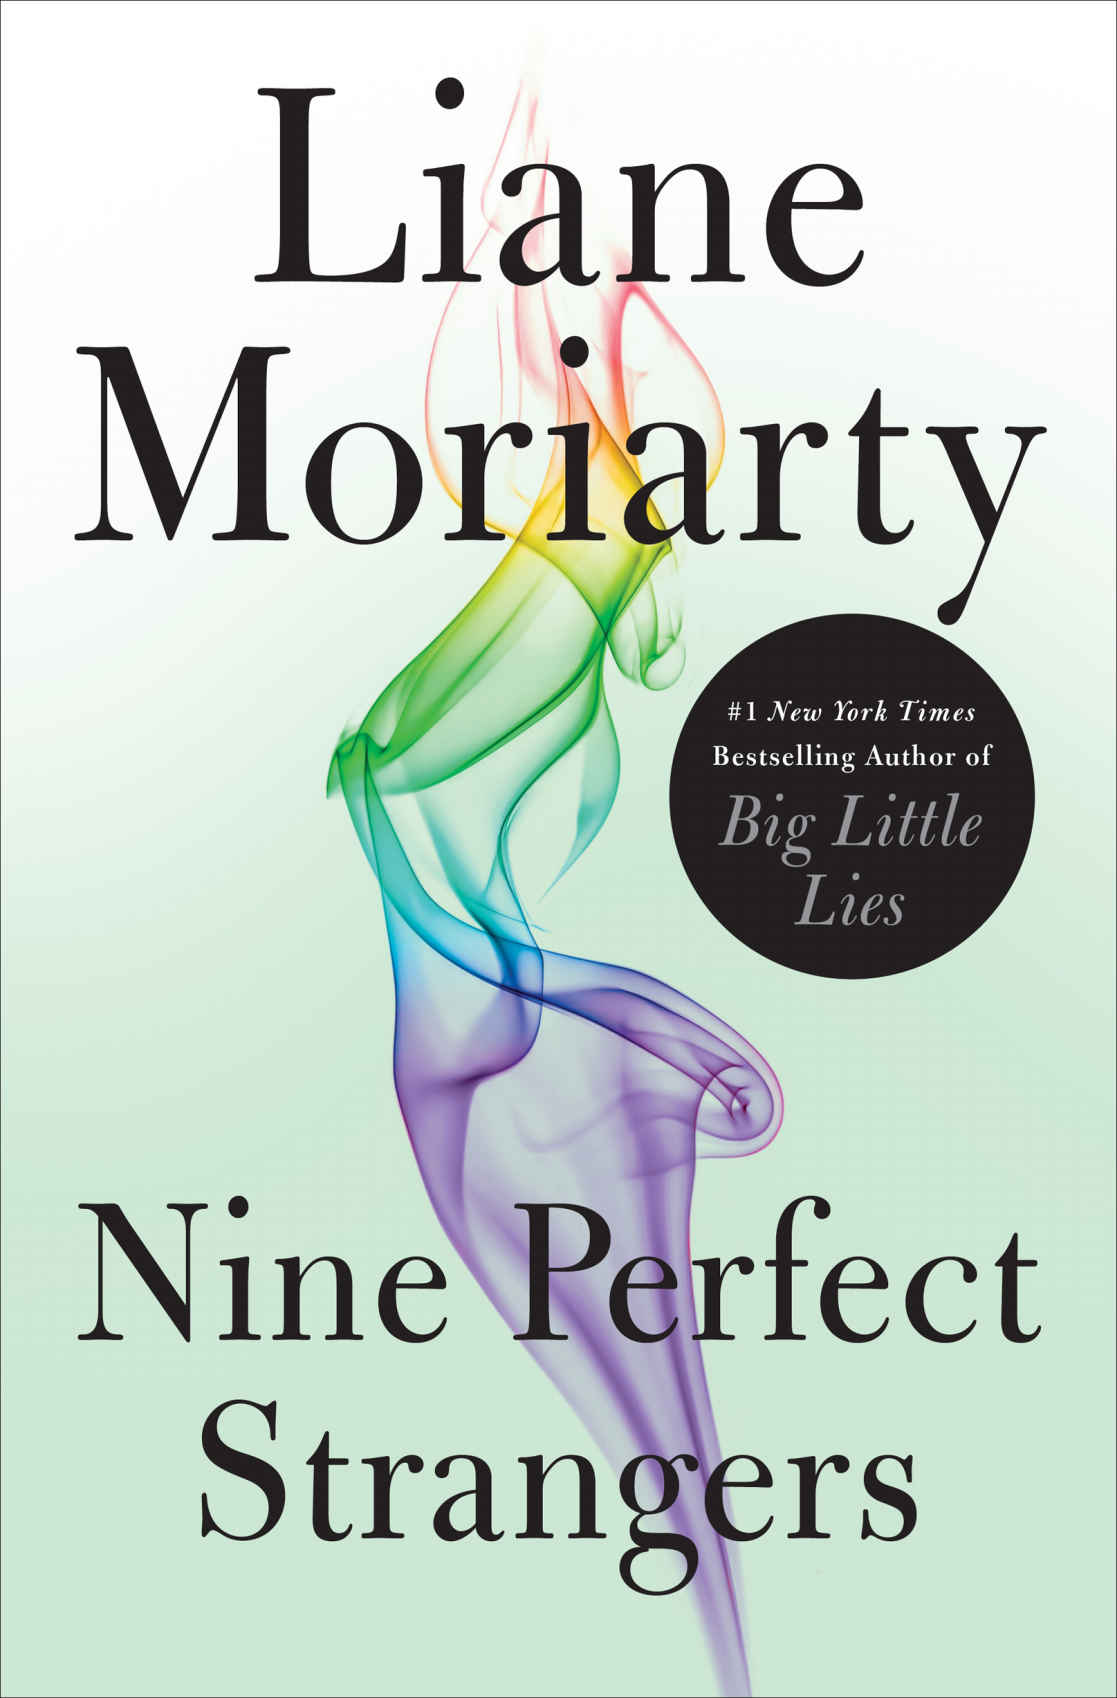 Nine Perfect Strangers by Liane Moriarty [ePub] - Epub Cafe